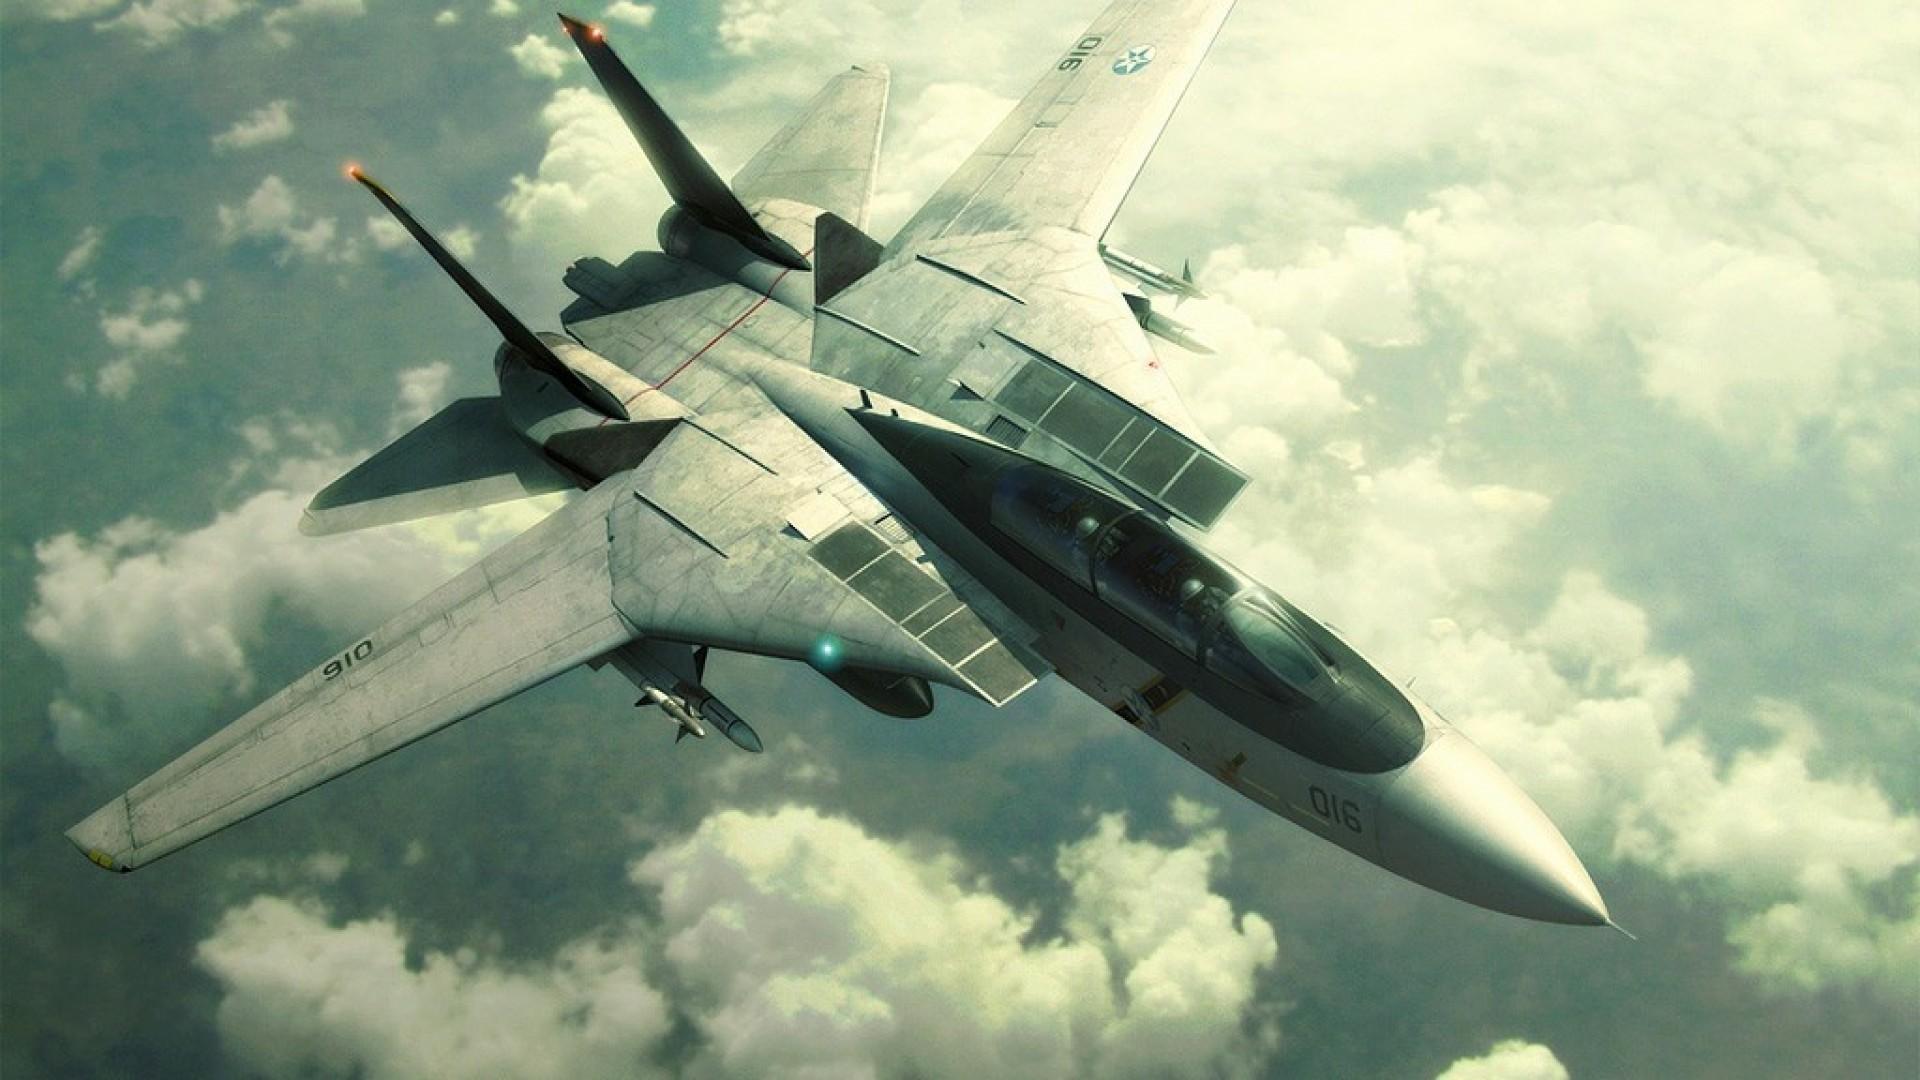 Ace Combat full screen hd wallpaper